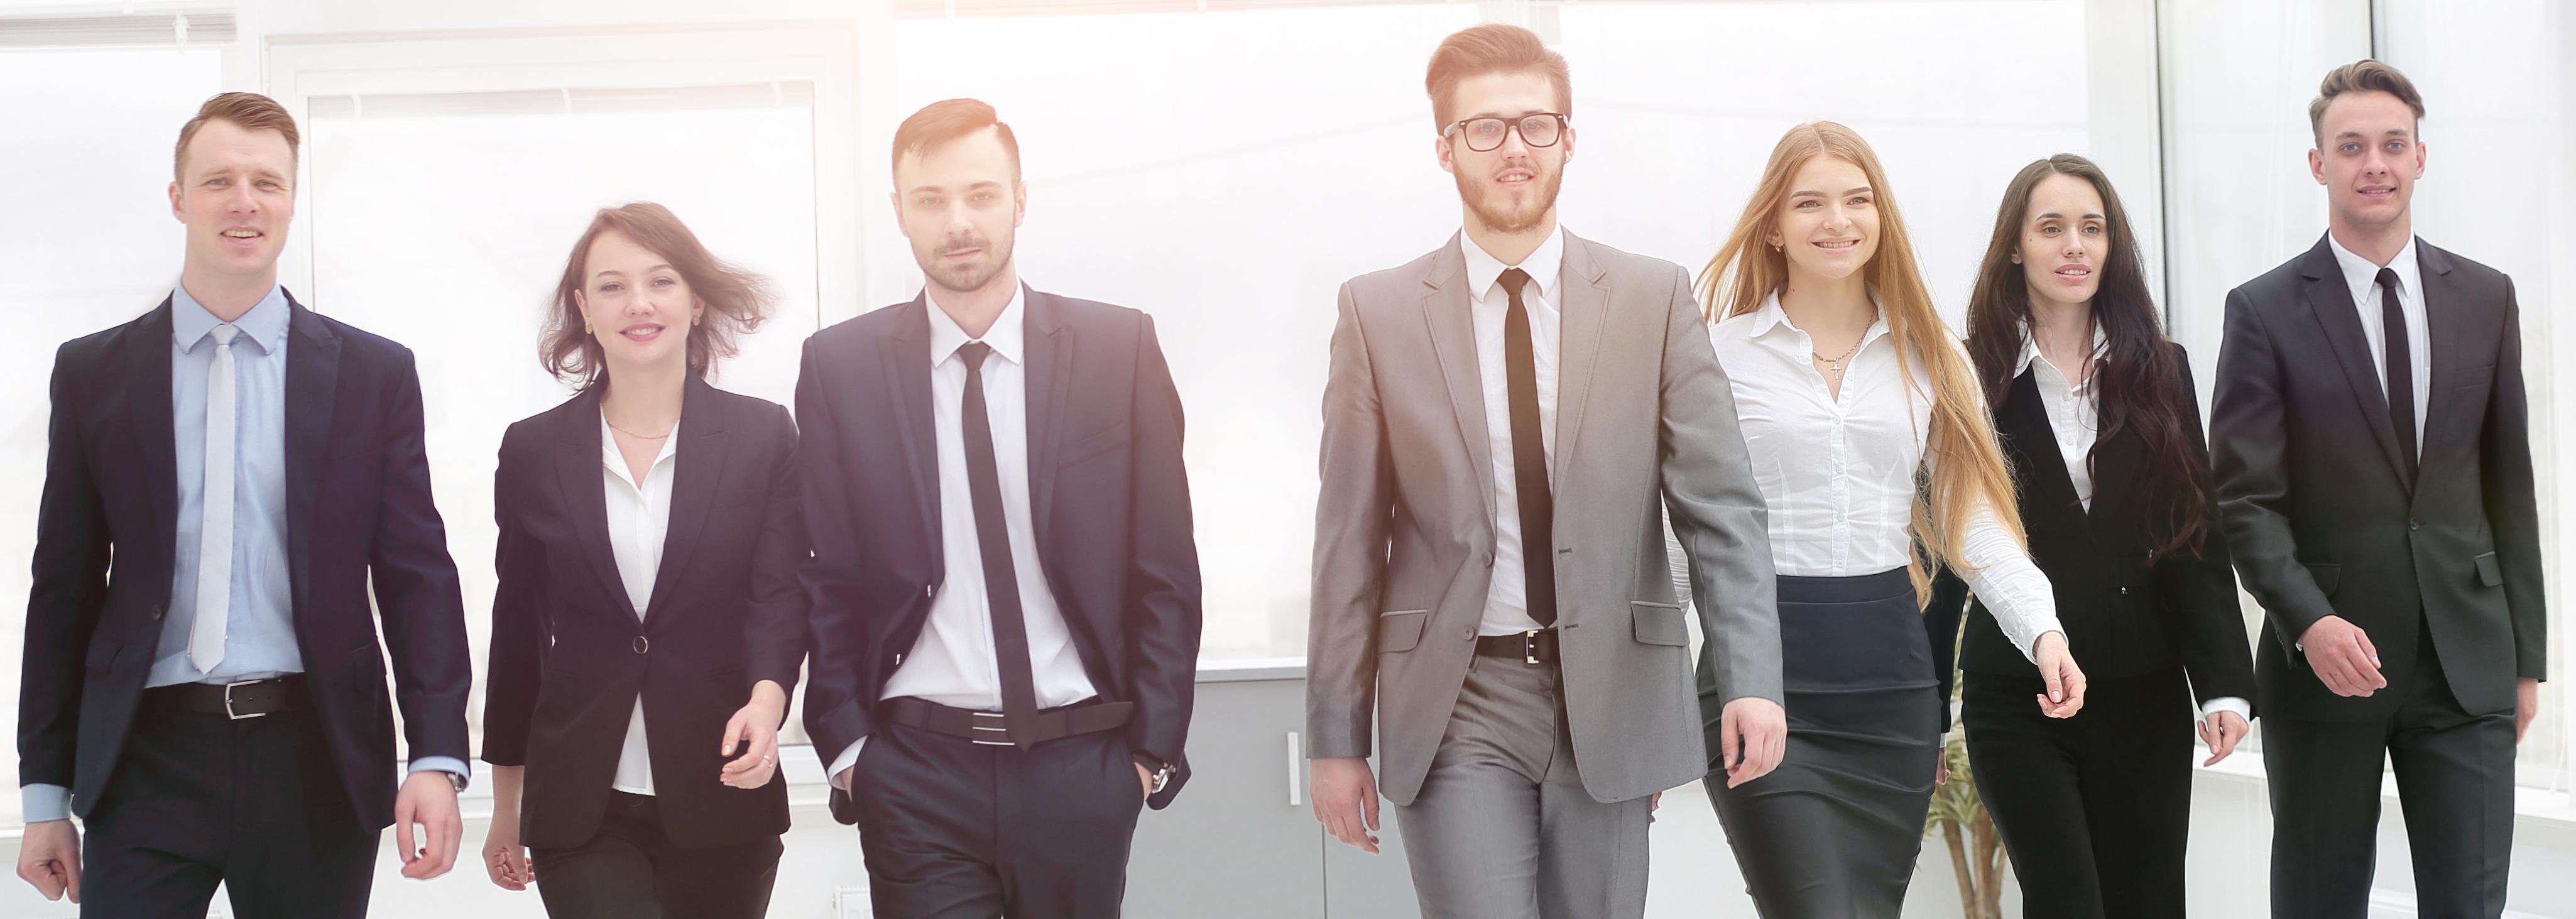 Managing Gov Workforce Challenges?